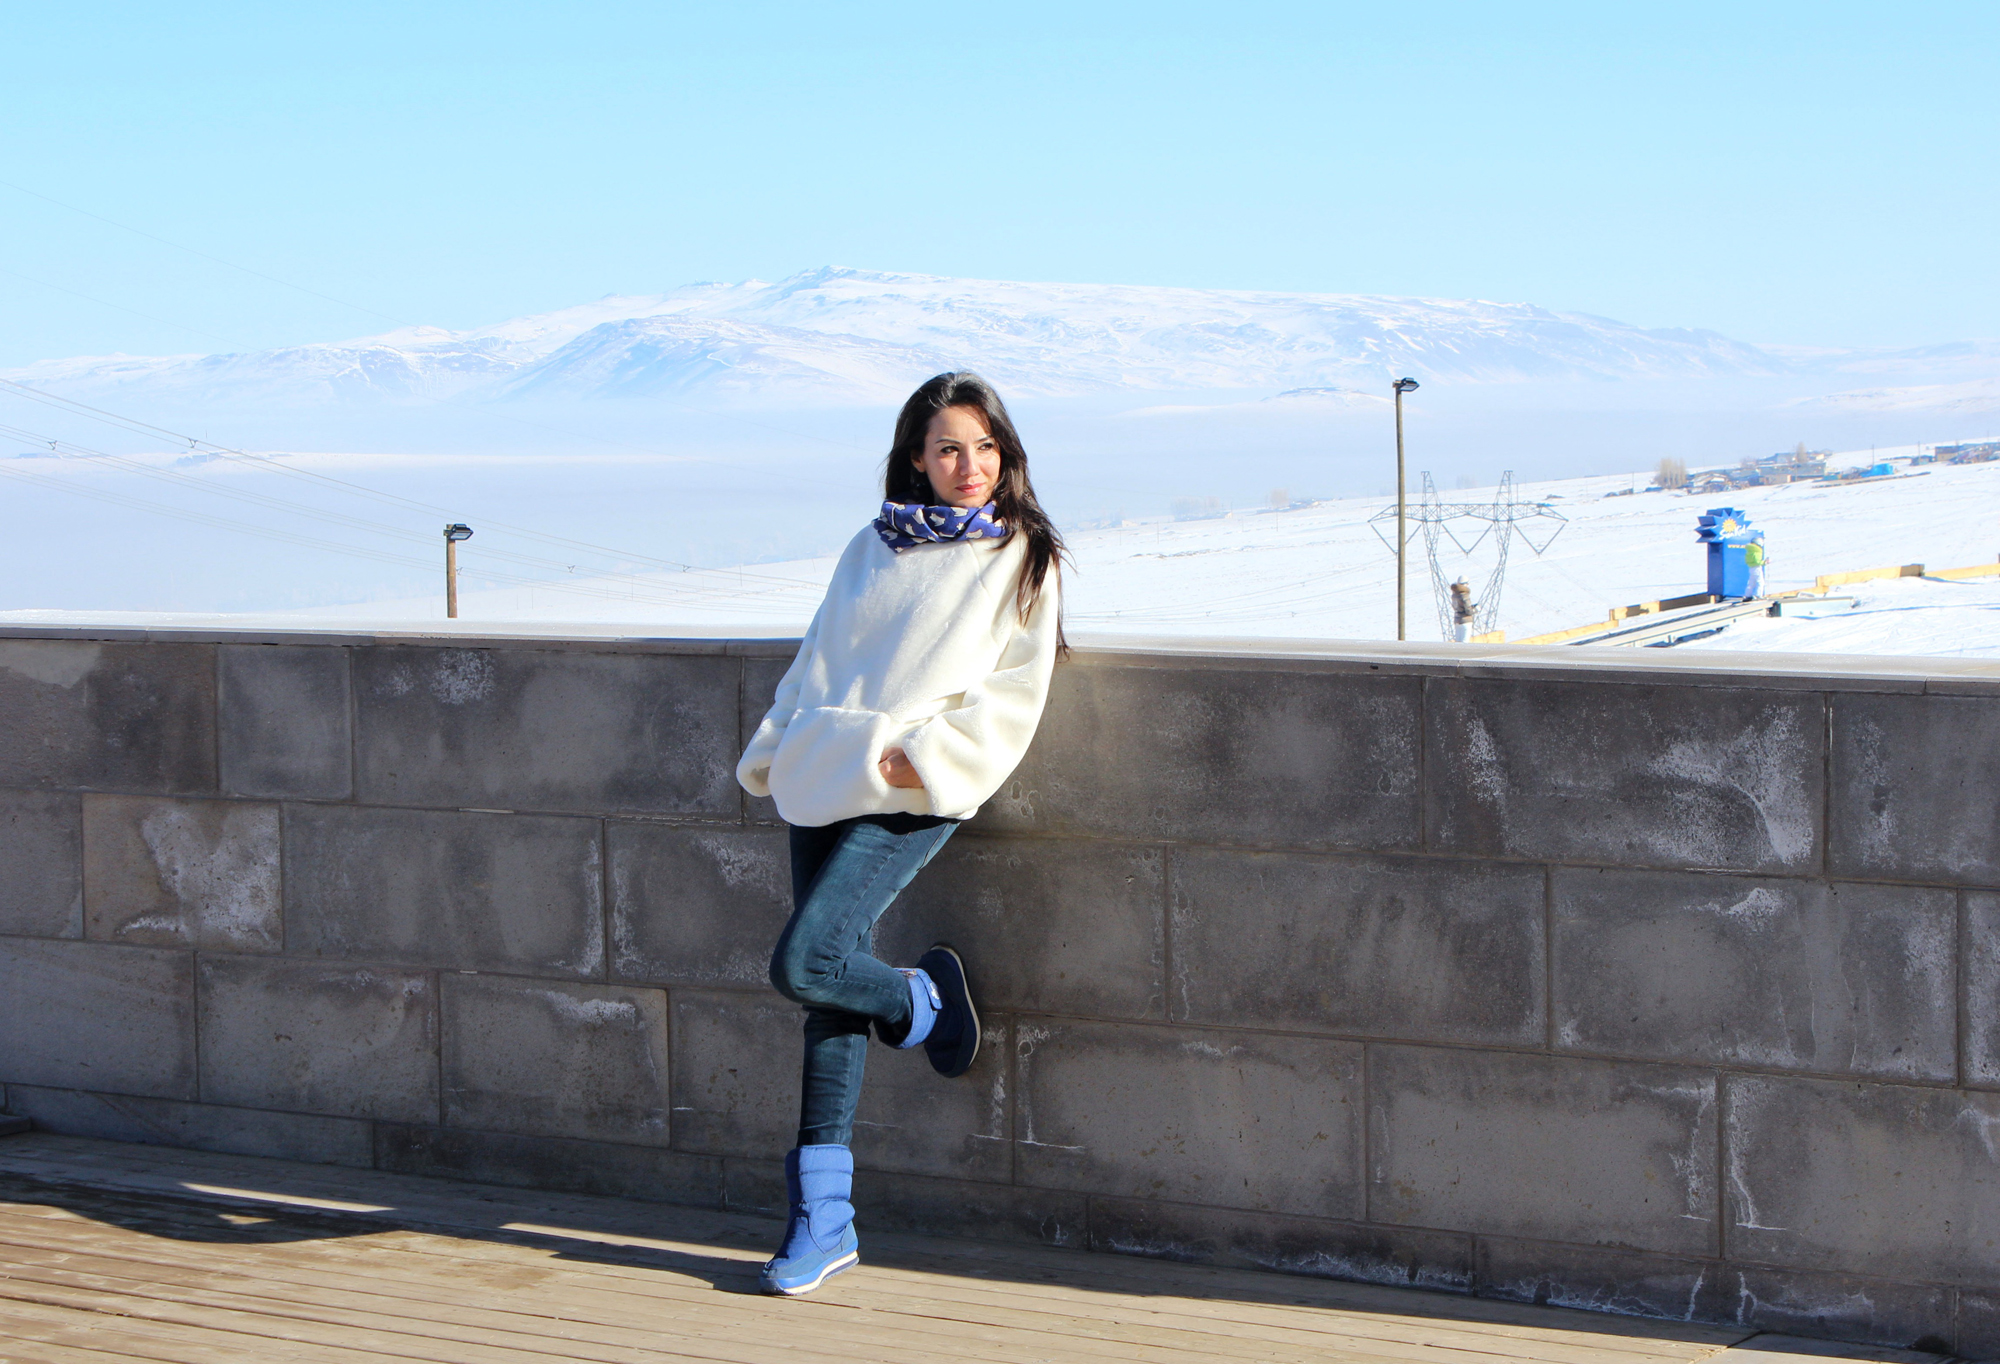 xanadu hotels snowwhite, kar tatili, kar, kayak tatili, ski, snow, erzurum, palandoken, snowboard, kayak tatilinde ne giyilir, fashion blogger, moda bloggerı, stil ipucu,kafdan by elaidi, rubberduck, snowjoggers, kar botu